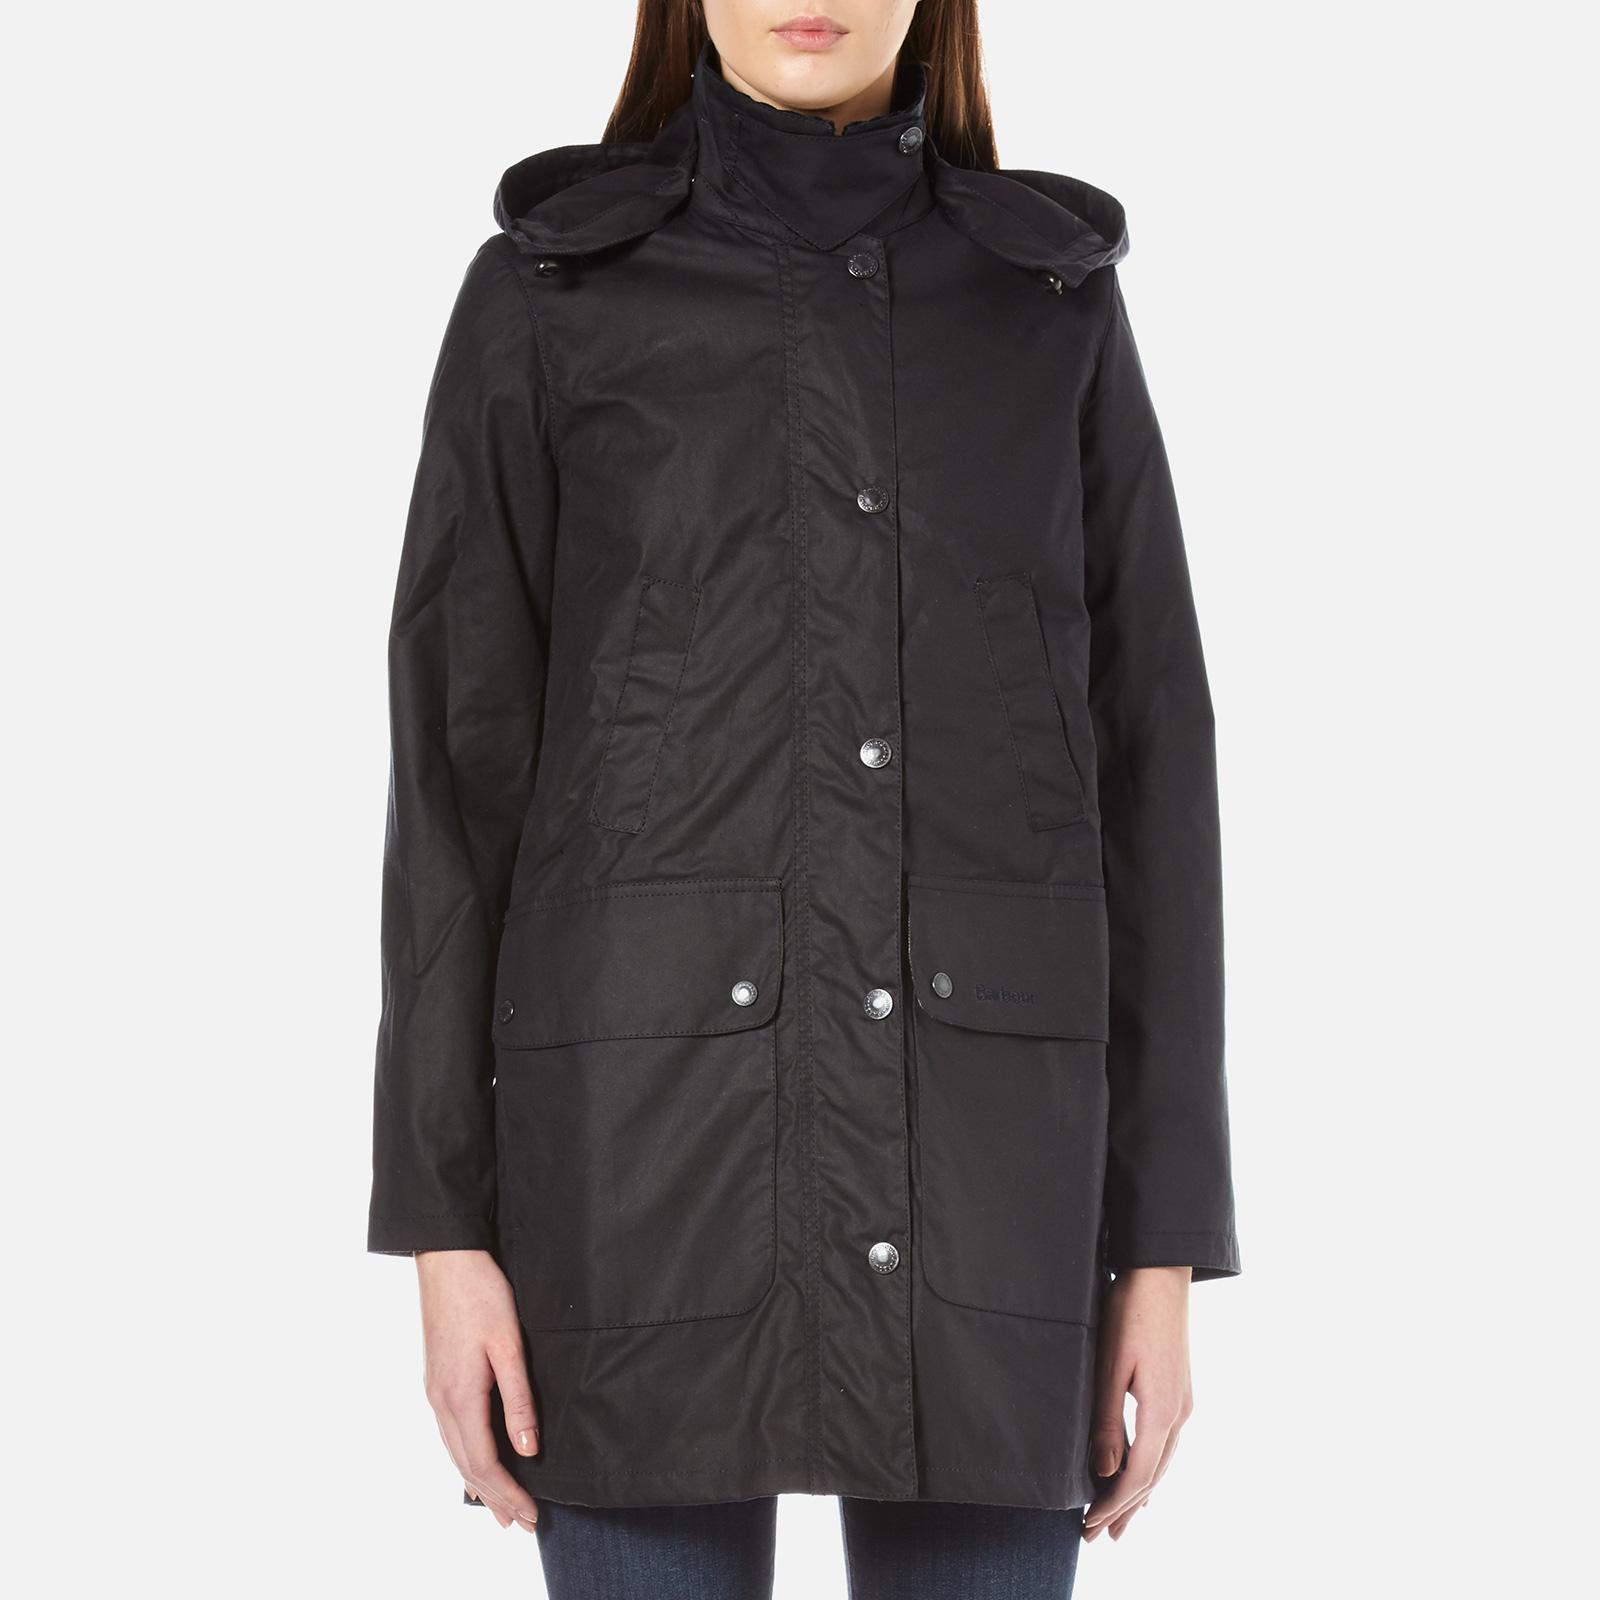 672fd047897 Barbour Heritage Women s Wax Border Jacket - Navy - Free UK Delivery over  £50